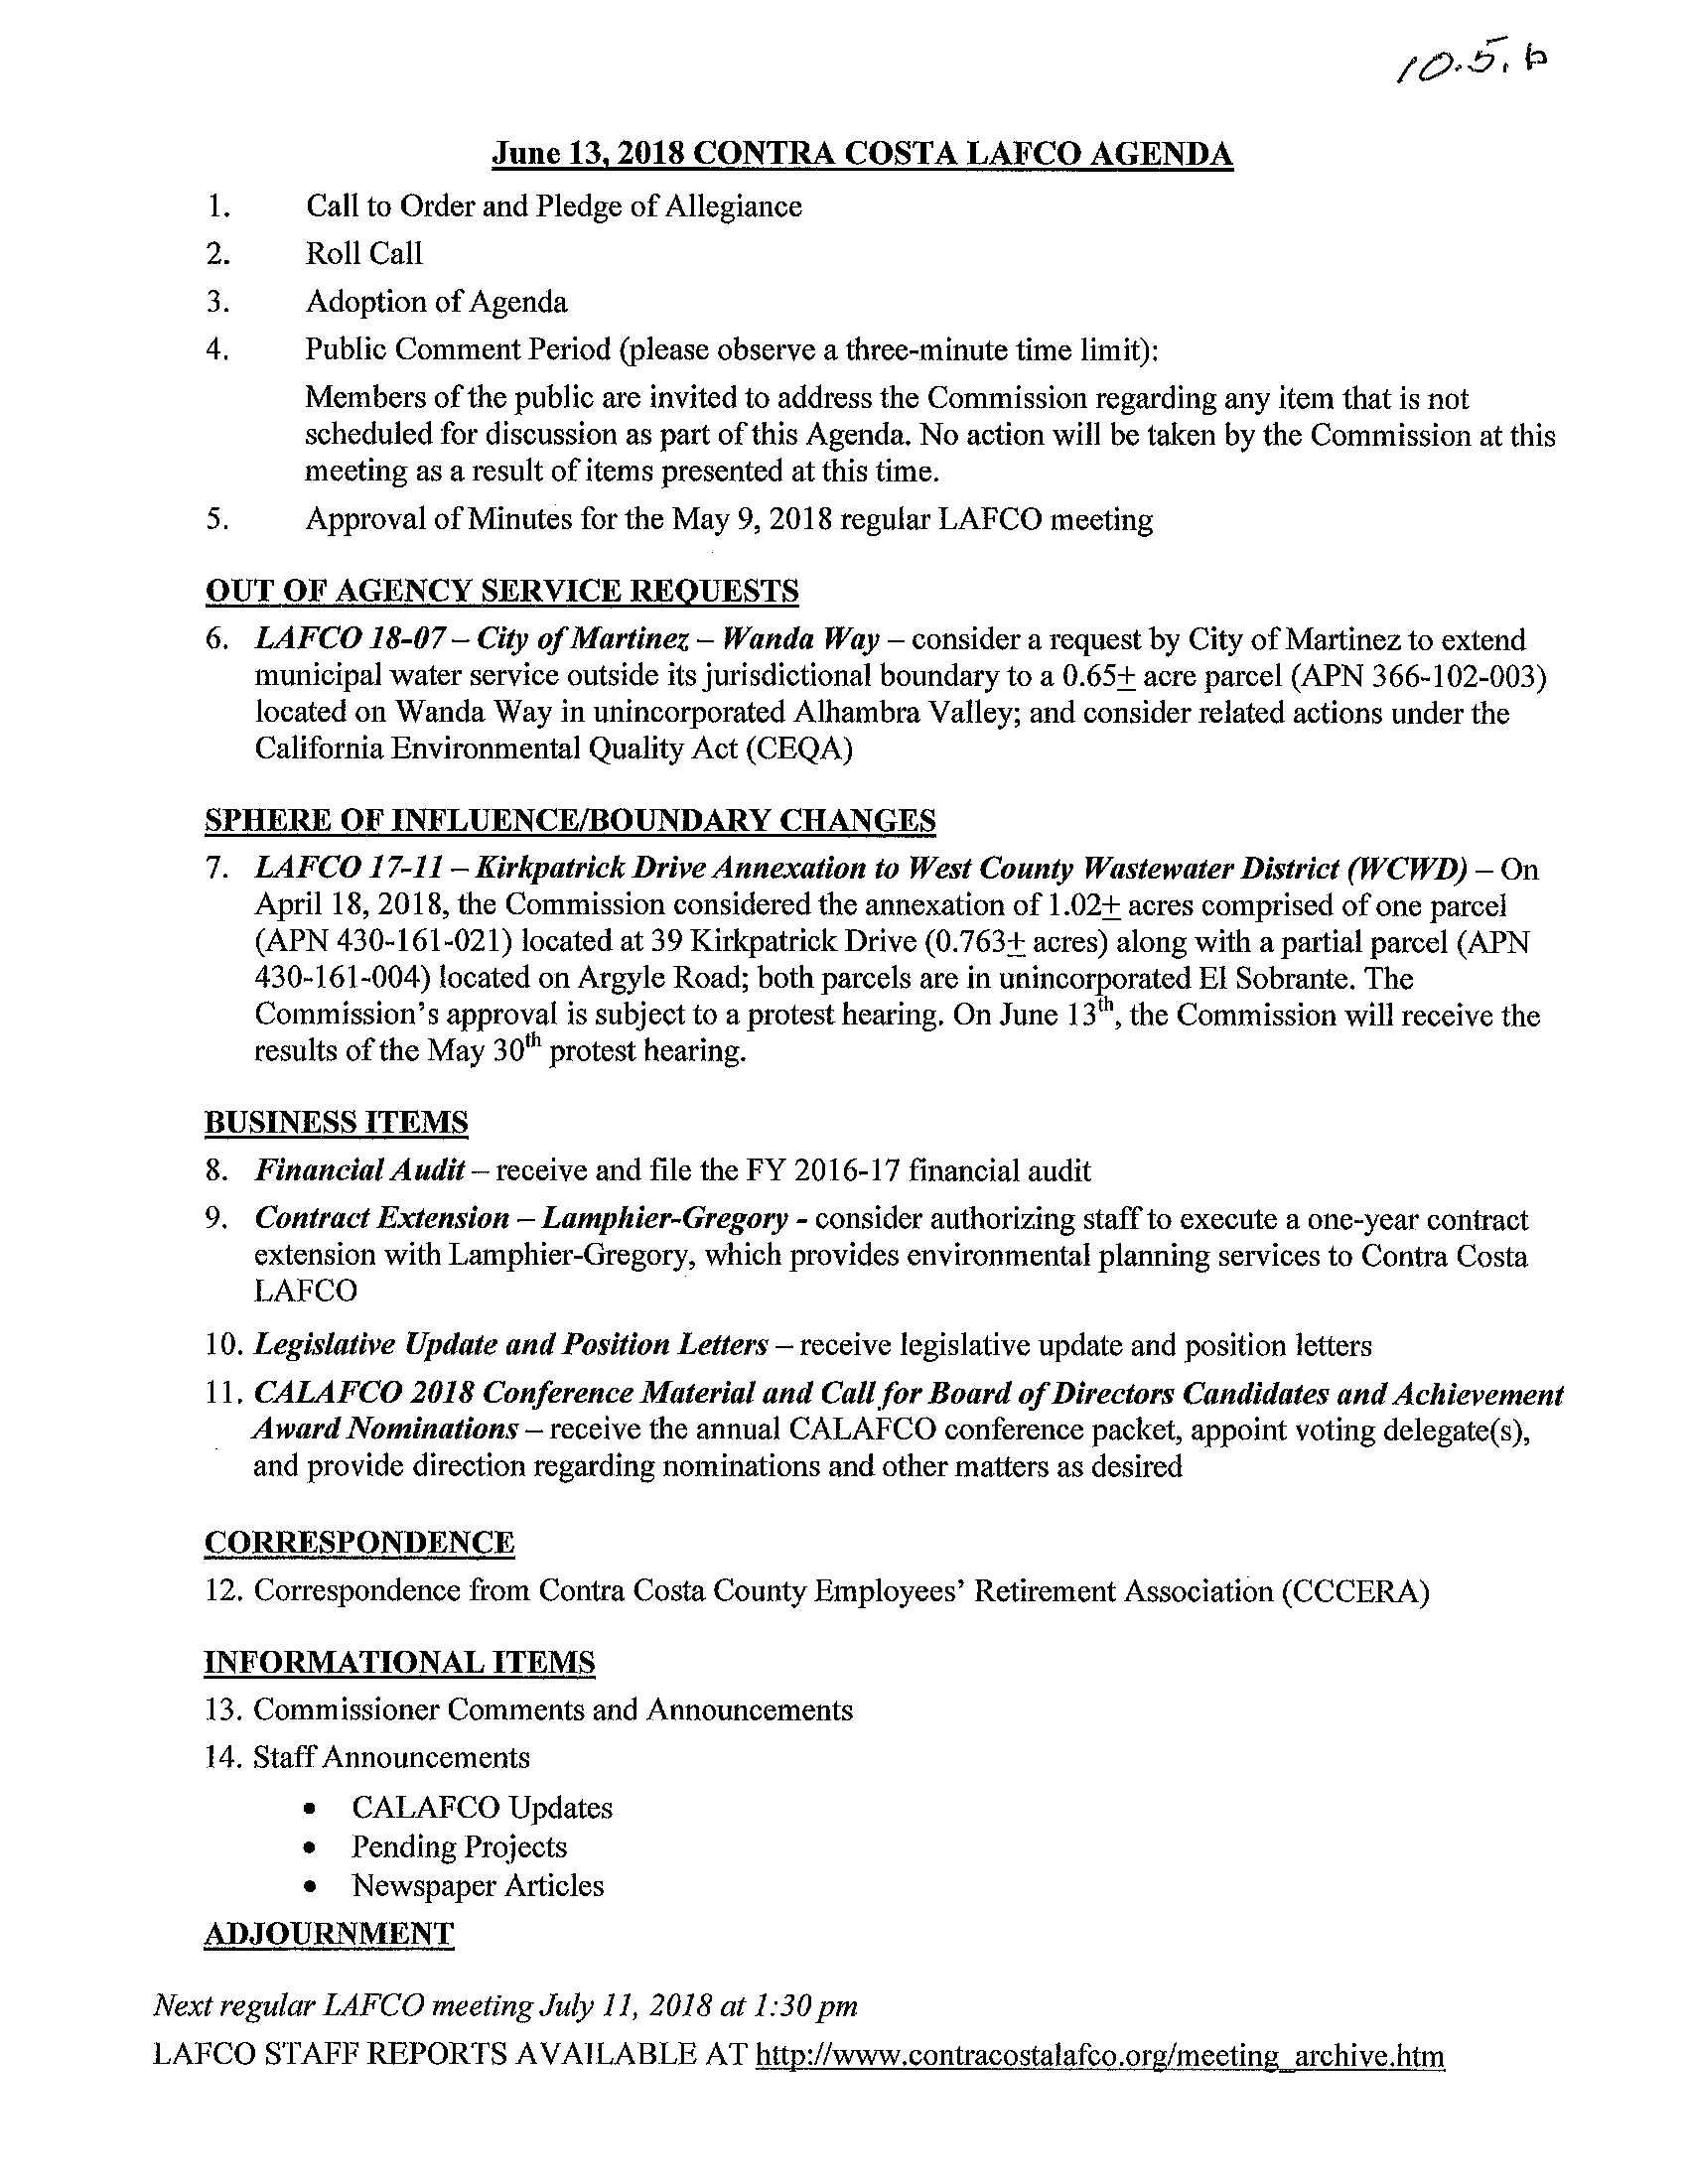 ESMAC Agenda 7.11.2018 (36 Pages)_34.jpg